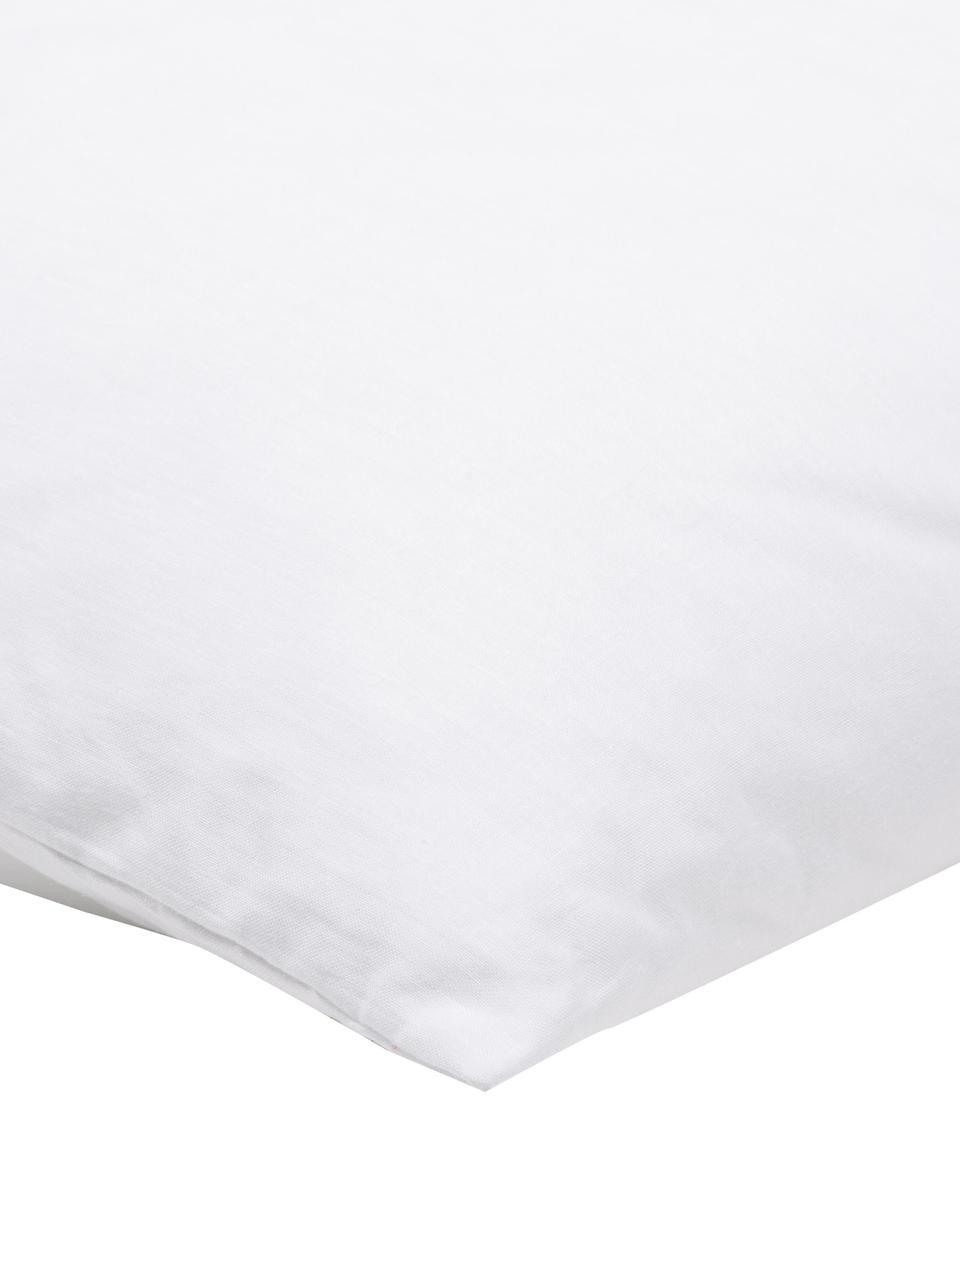 Imbottitura per cuscini in microfibra Sia, 50 x 50, Bianco, Larg. 50 x Lung. 50 cm